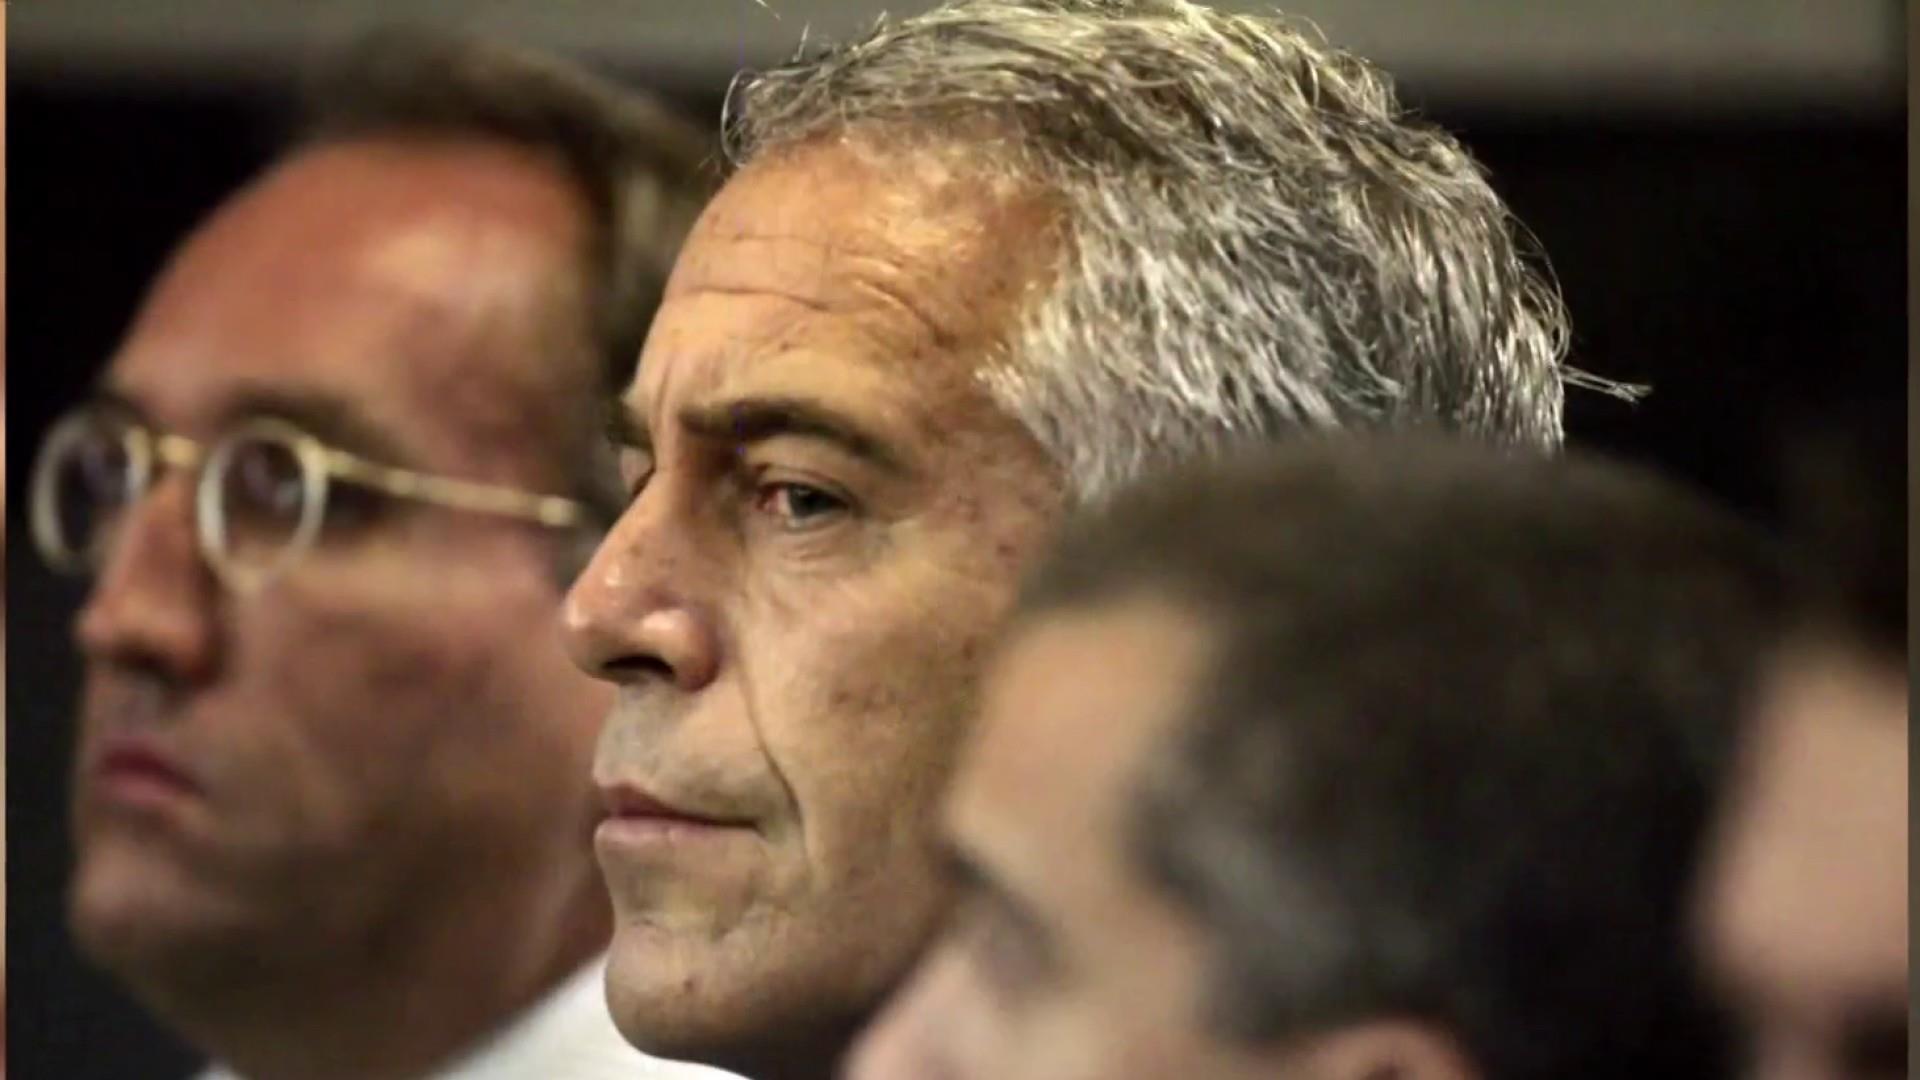 Powerful figures 'brace for impact' in Jeffrey Epstein case